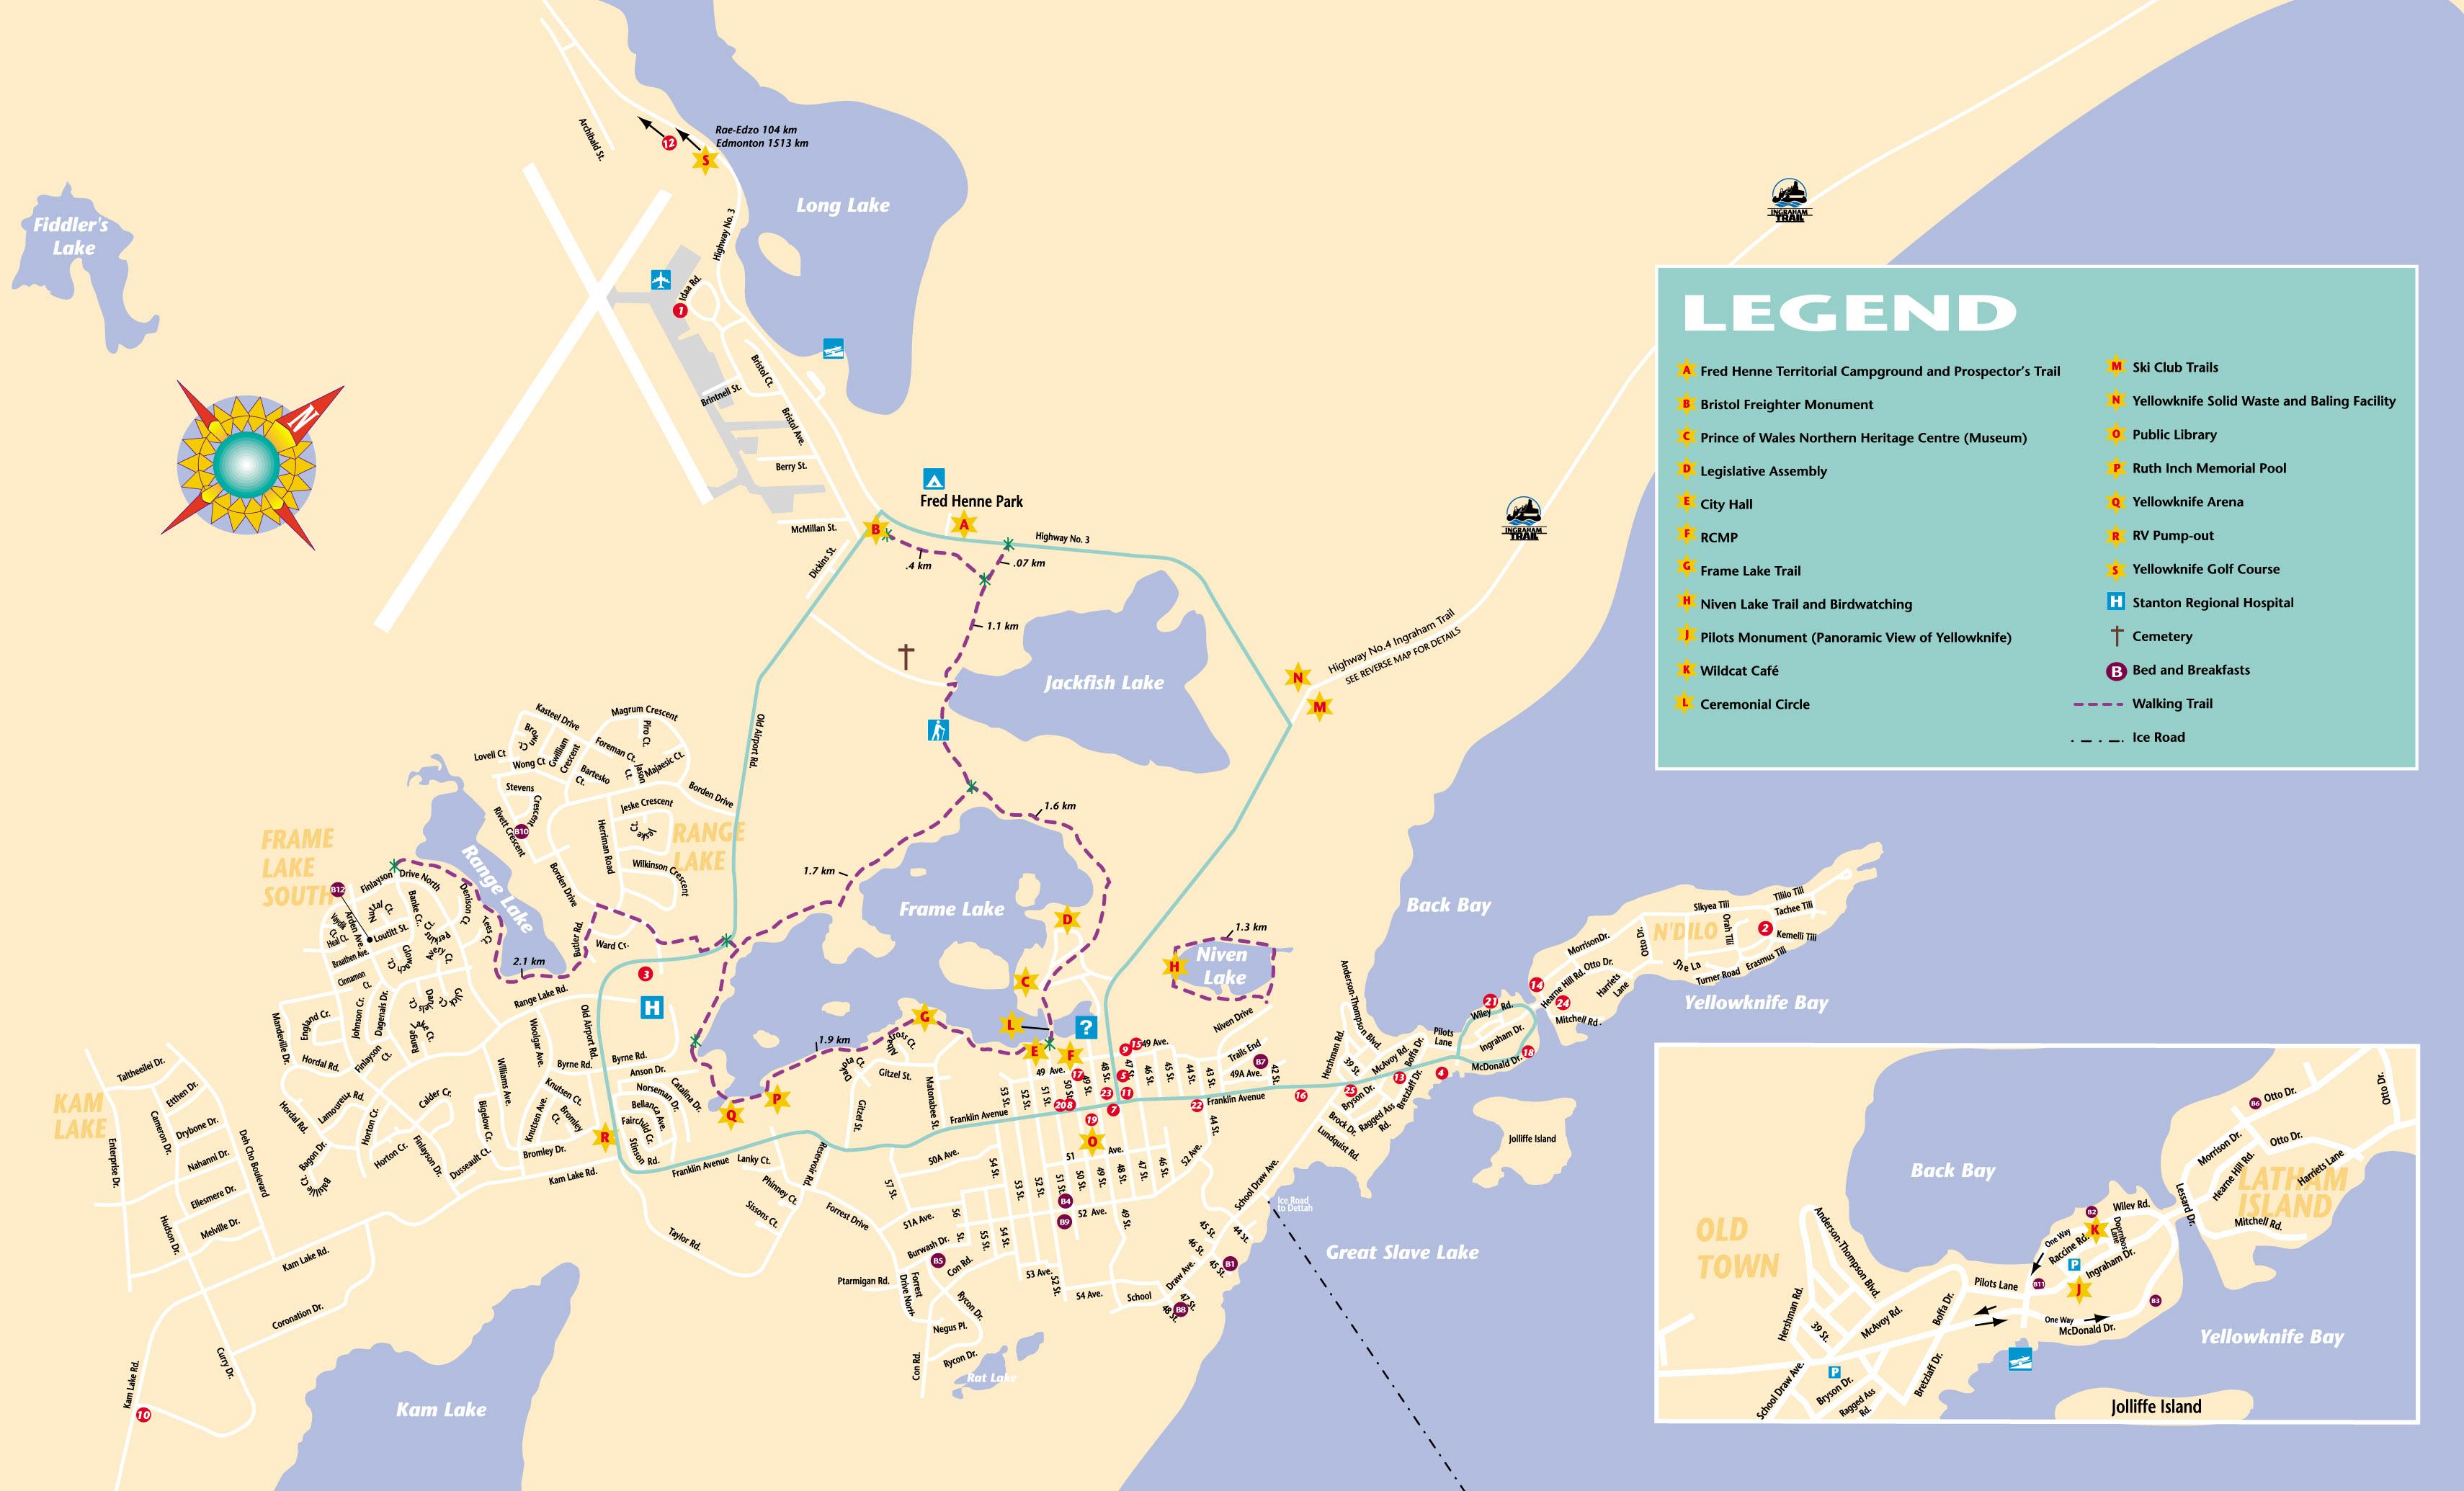 Map Of Canada Yellowknife.14th International Congress On Circumpolar Health Location